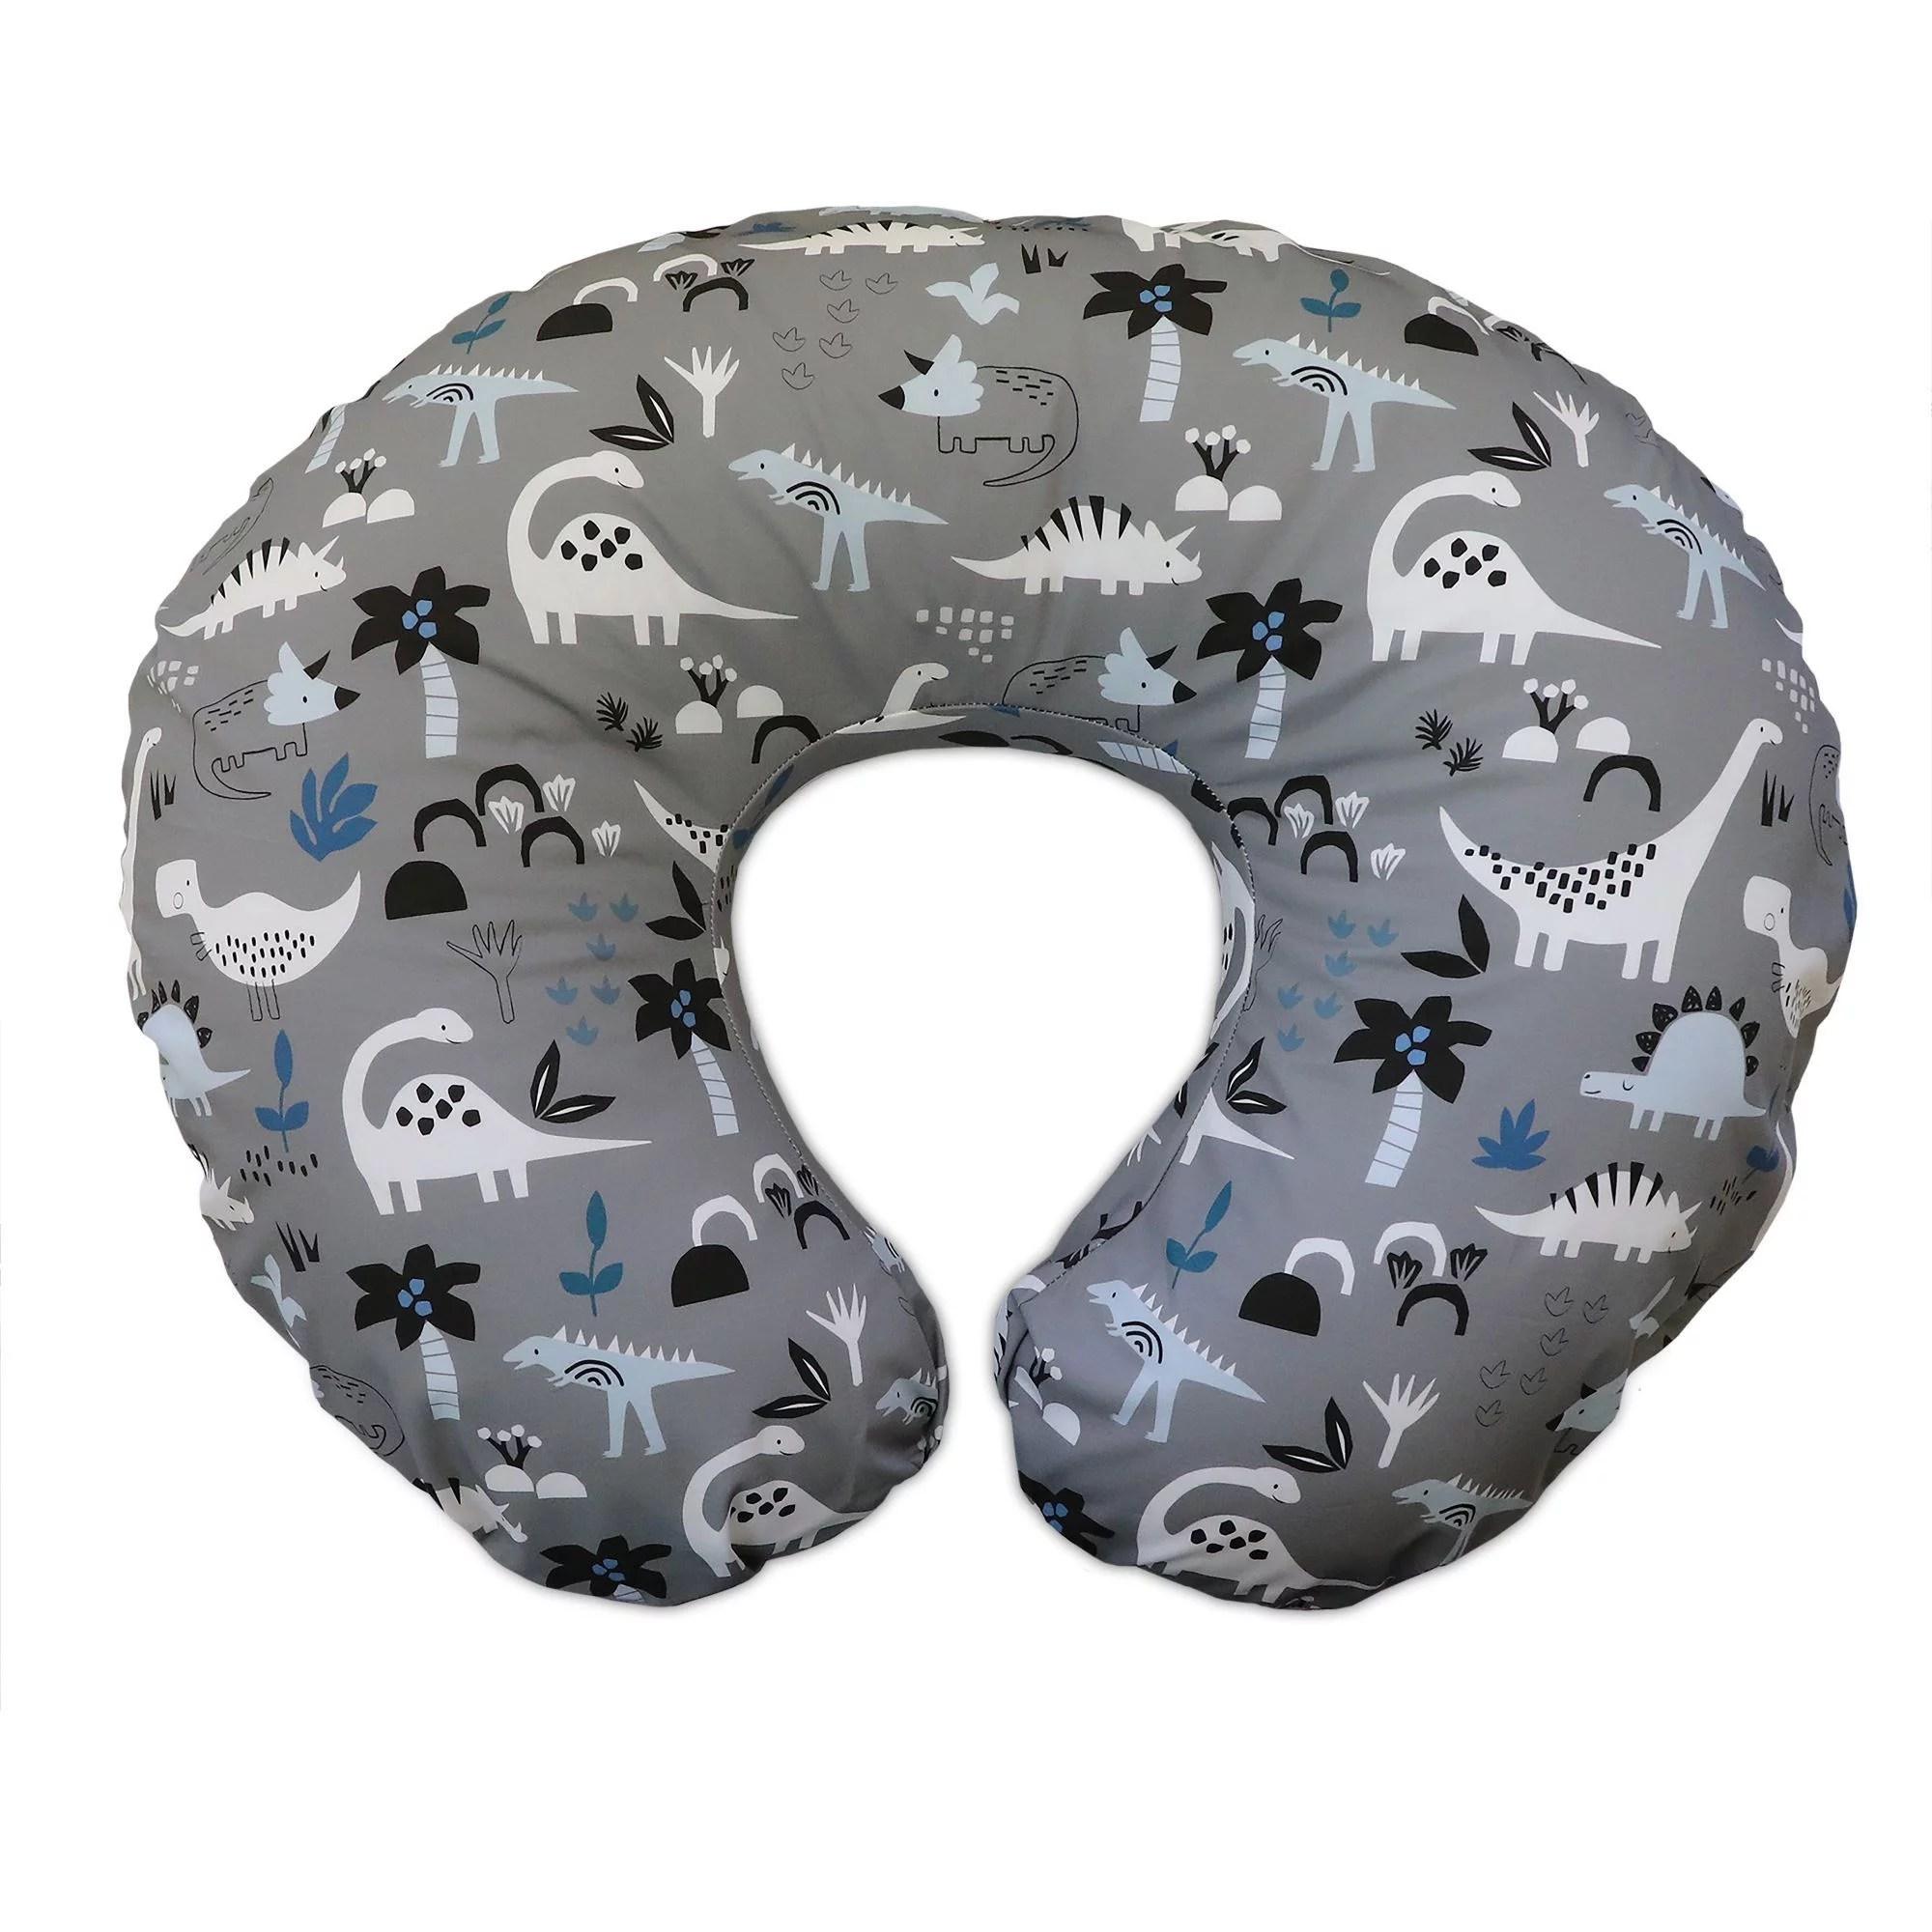 boppy original nursing pillow and positioner cotton blend gray dinosaurs